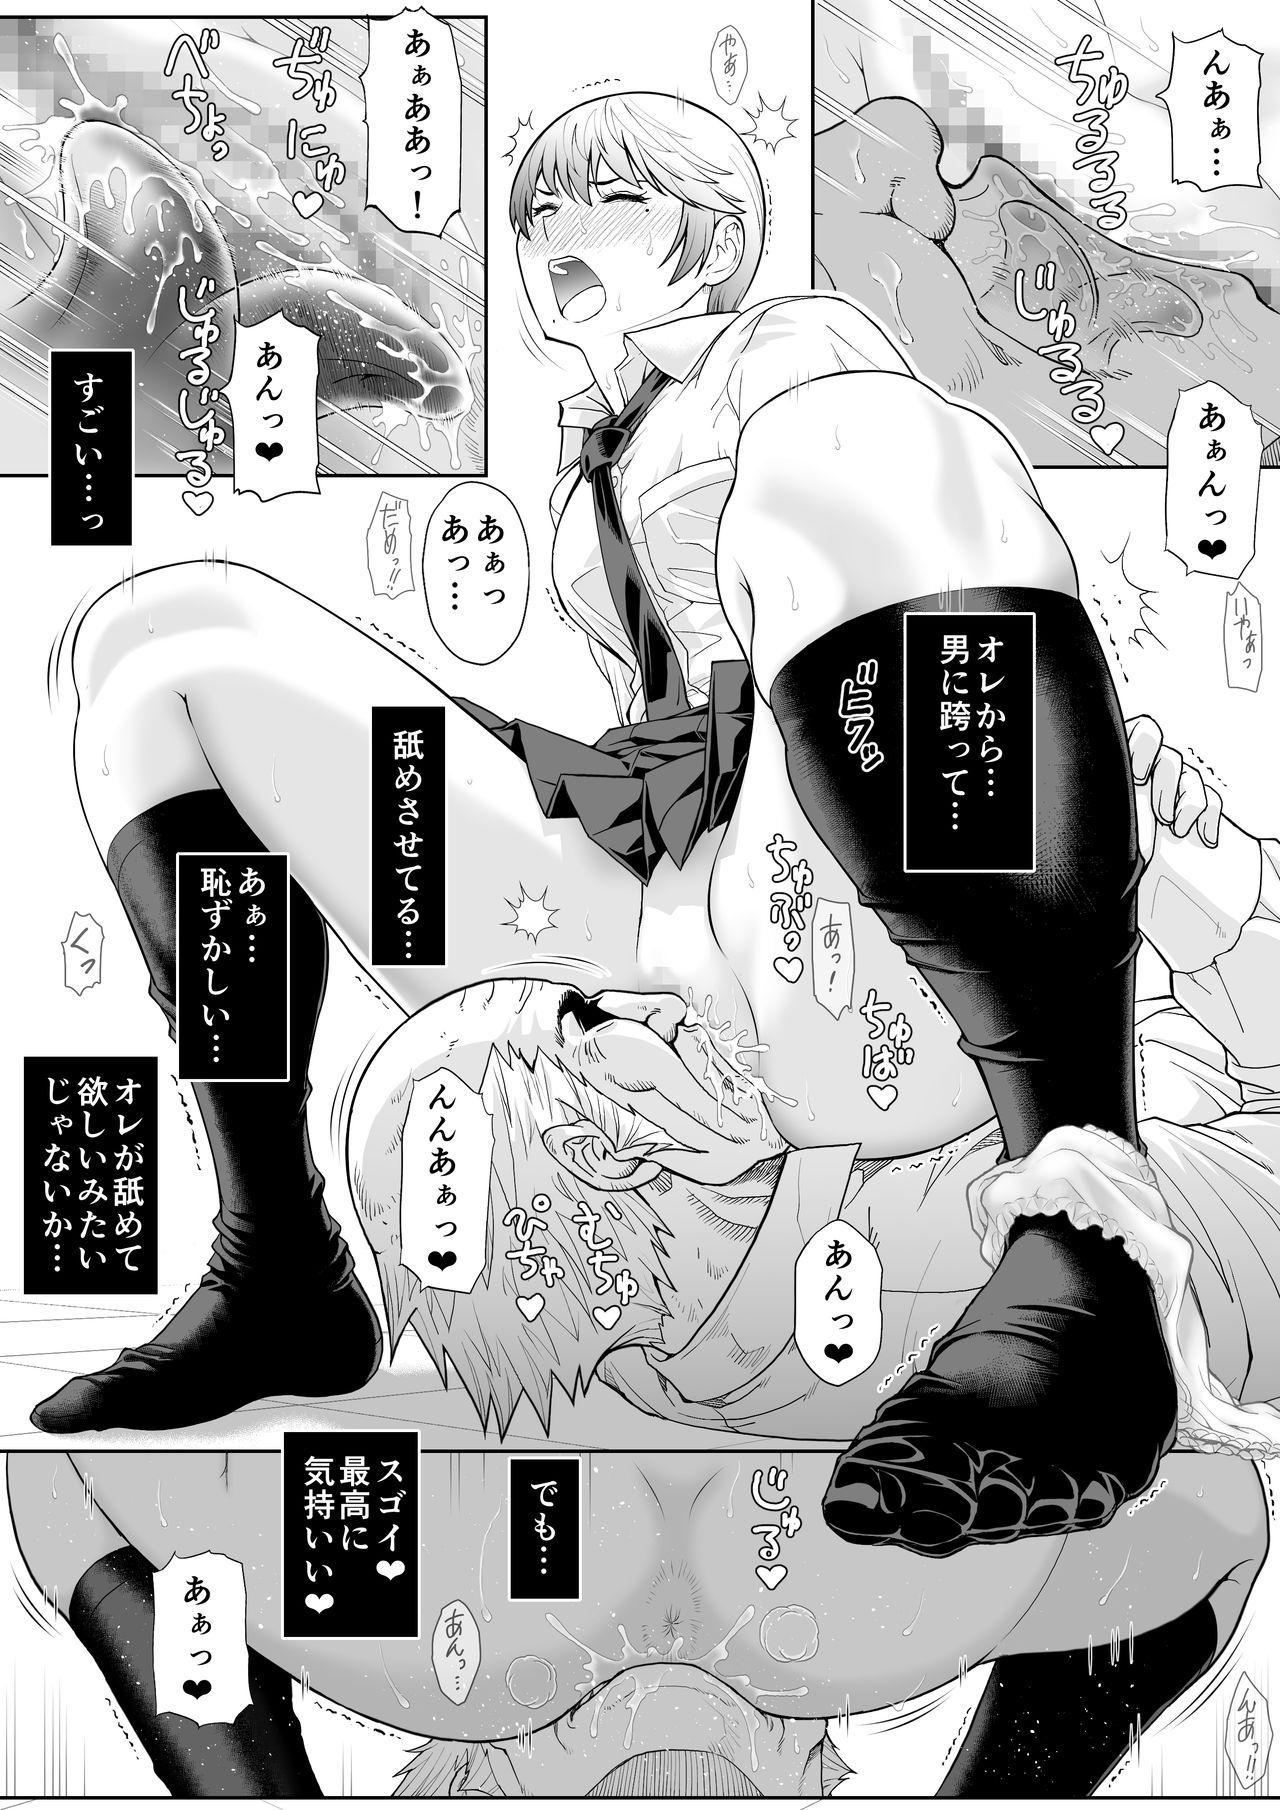 Namaiki mmusume ni tsuyo ● ikīki jugyō 66